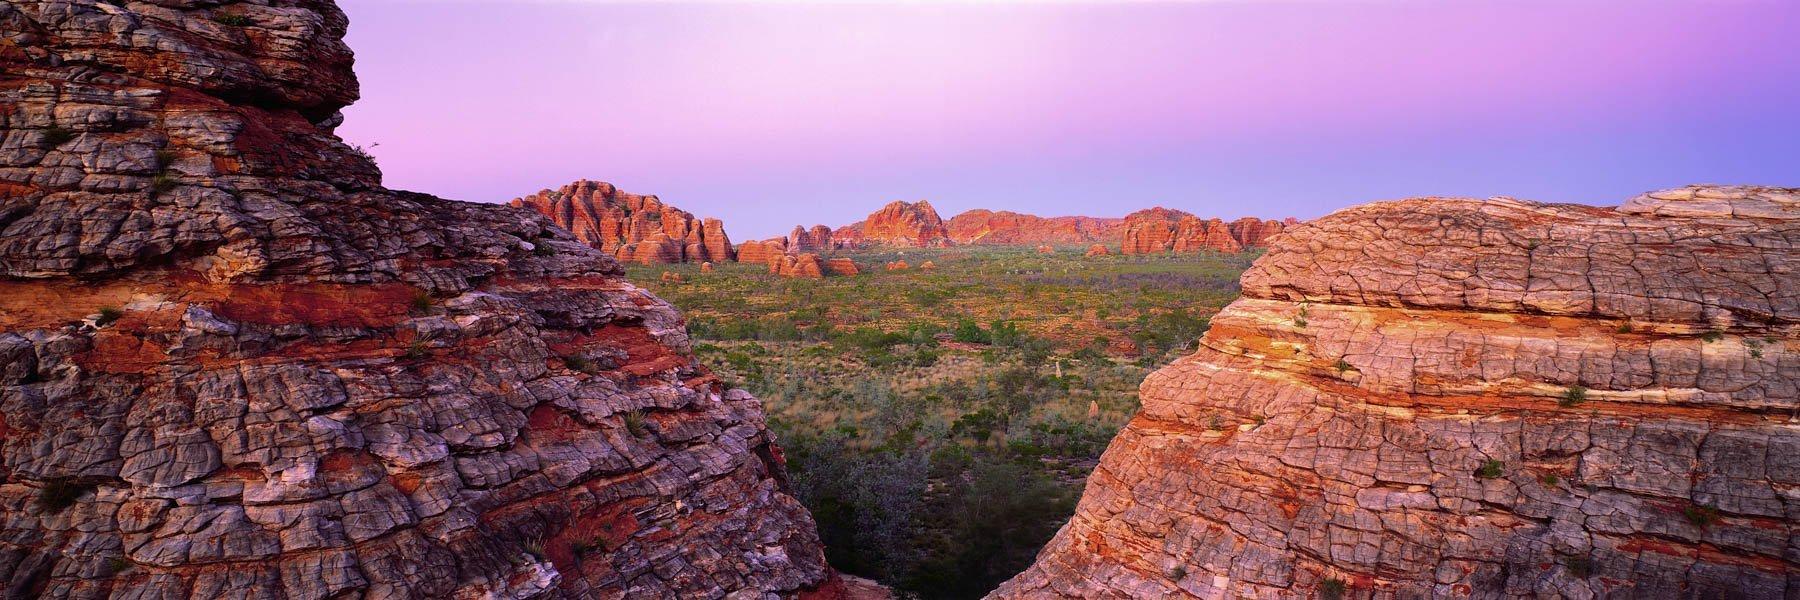 Twlight glow over the domes of The Bungle Bungles, Purnululu National Park, WA, Australia.